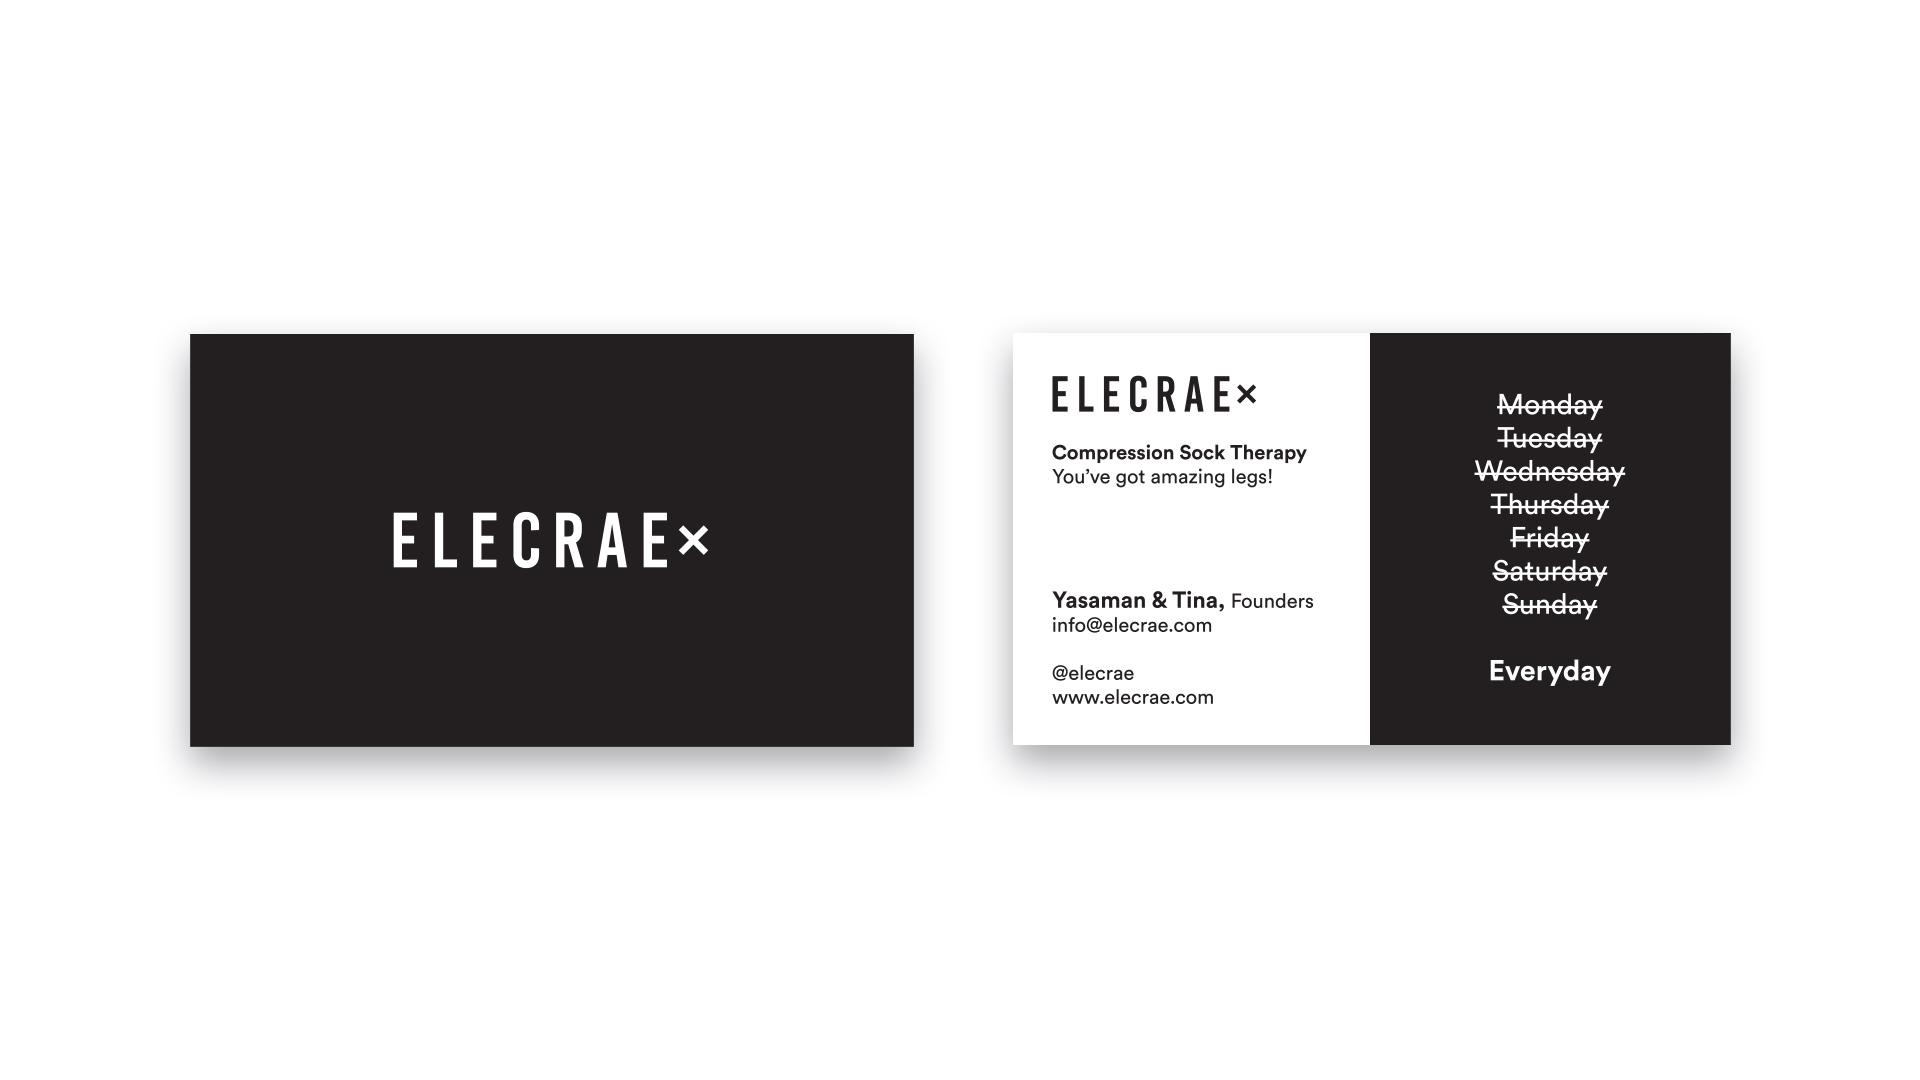 Elecrae Compression Socks Business Cards